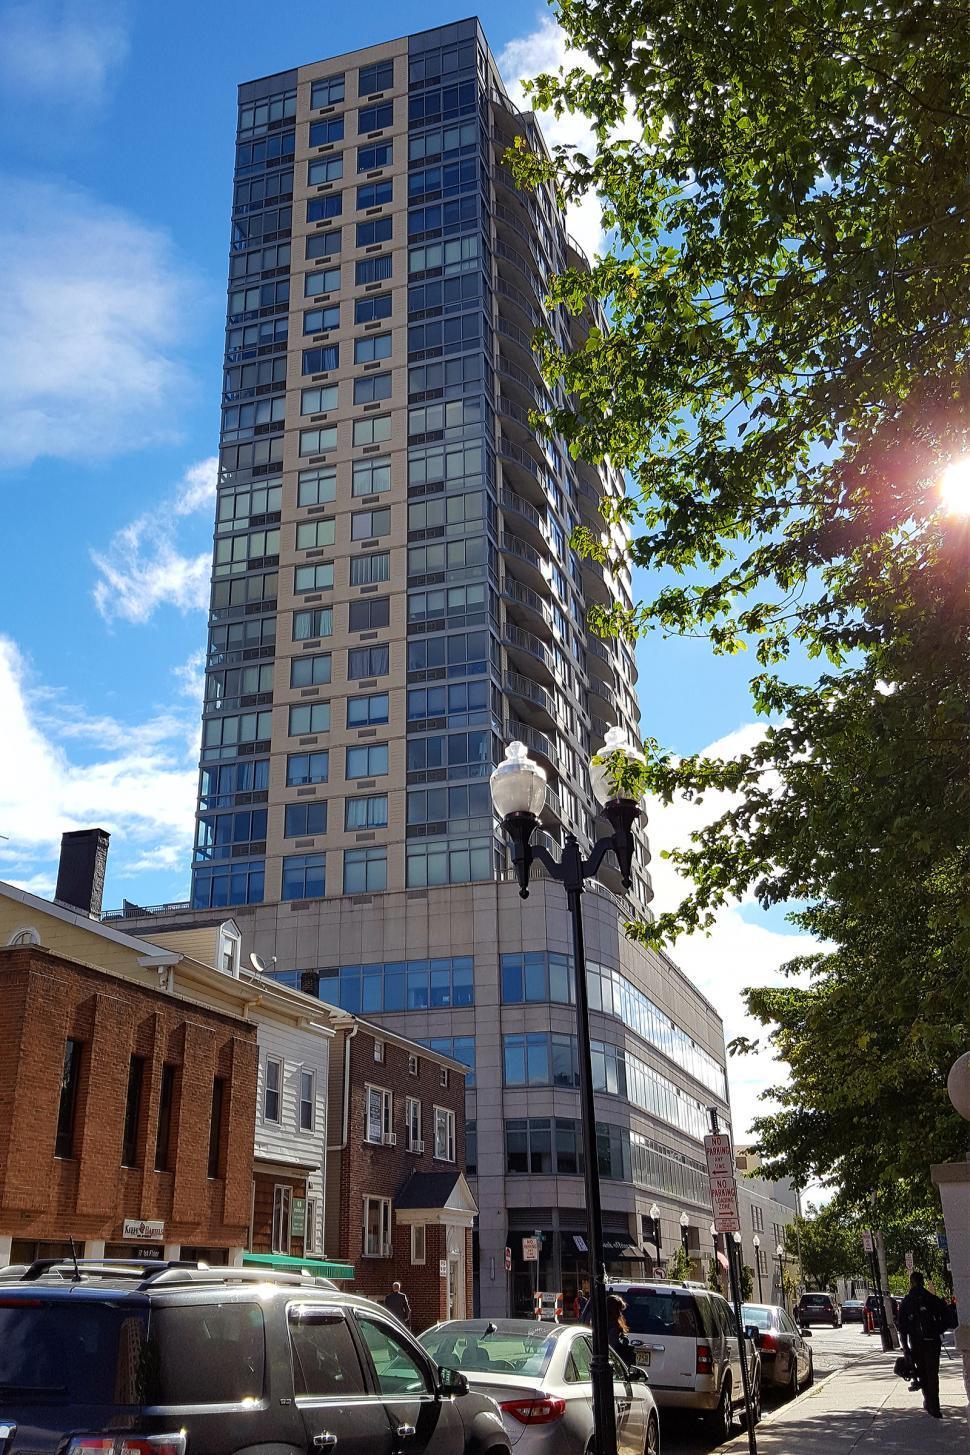 Download Free Stock HD Photo of Residental Building New Brunswick NJ Online